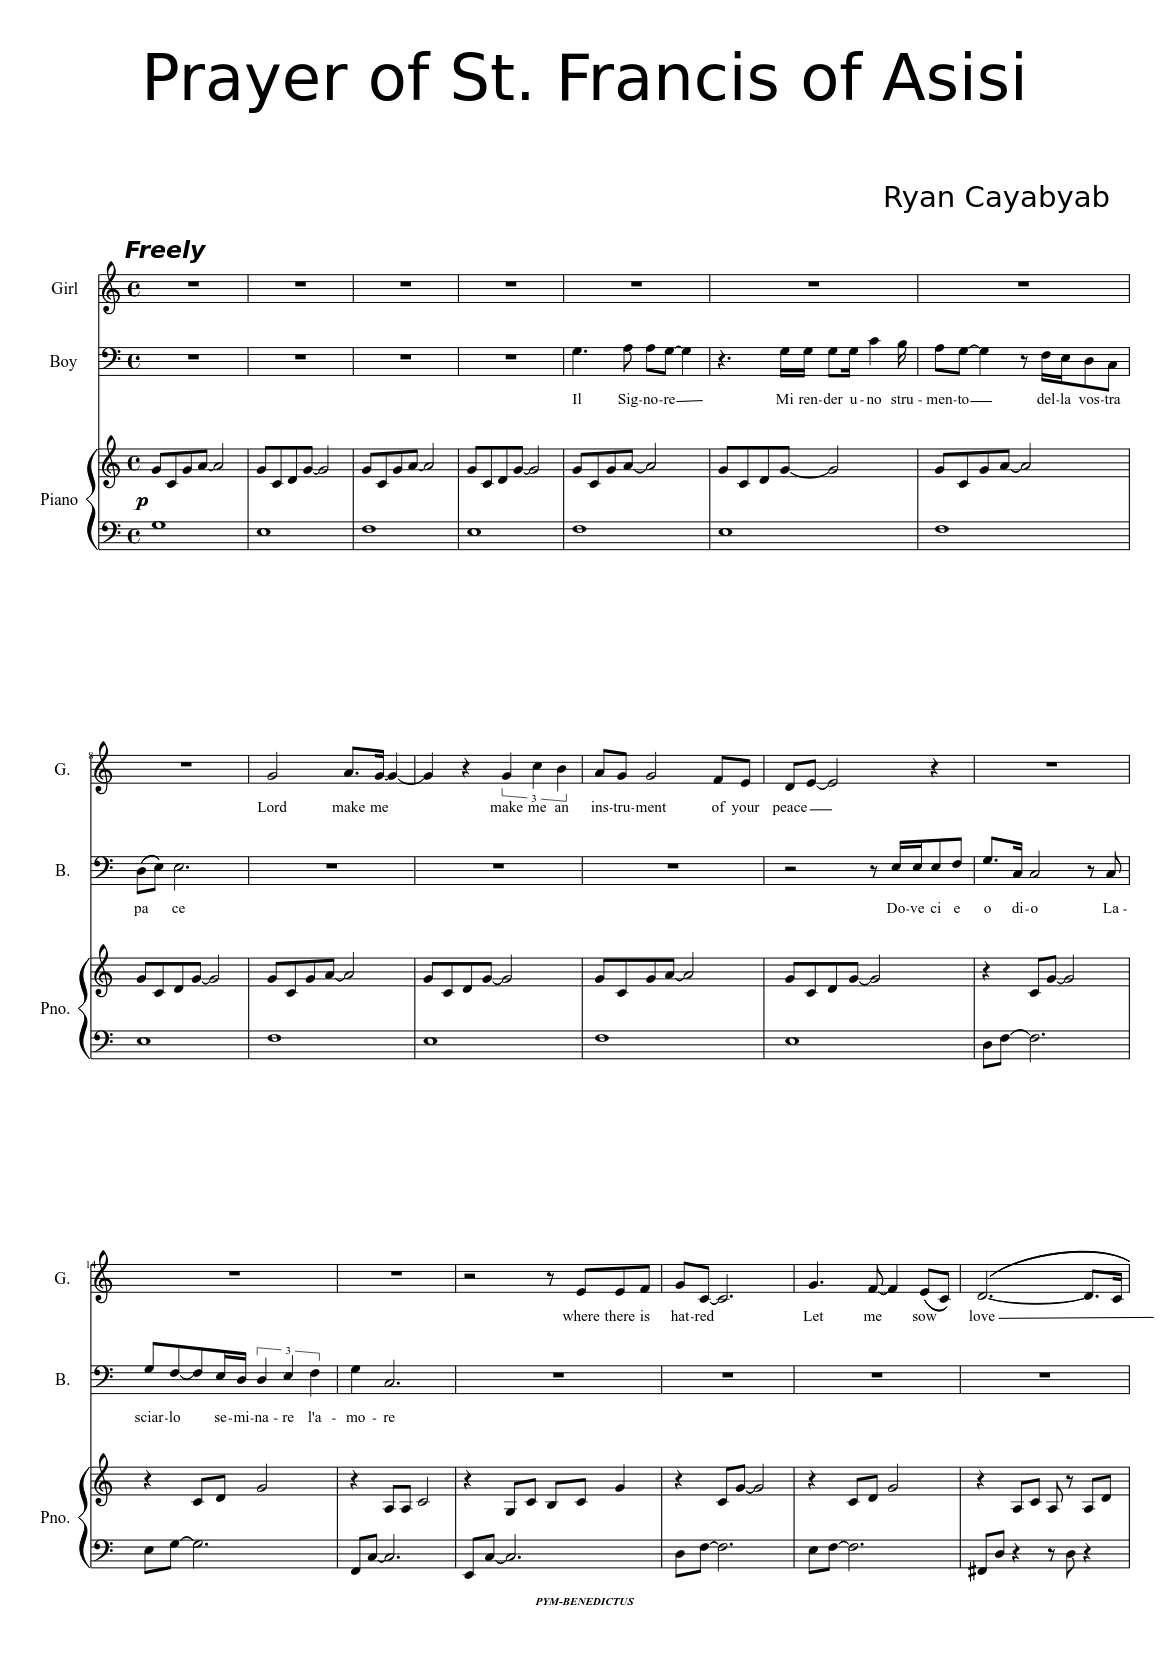 prayer of st. francis ryan cyabyab sheet music for piano (solo)    musescore.com  musescore.com